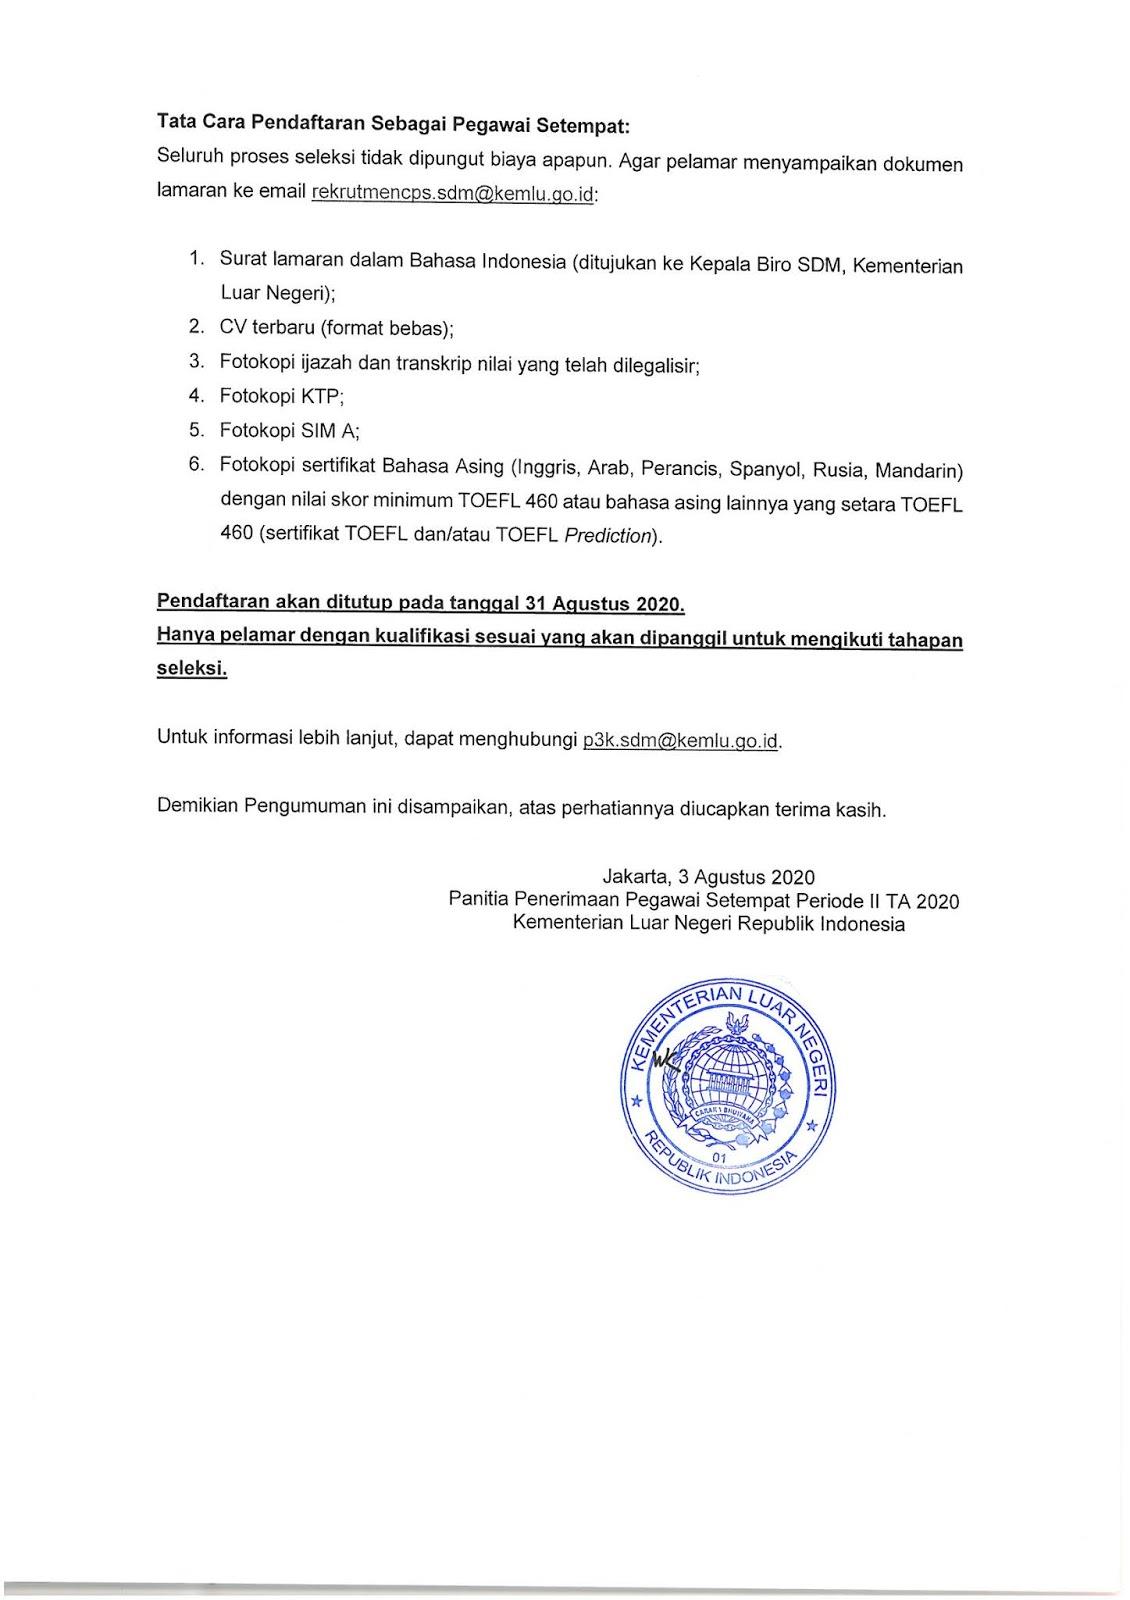 Penerimaan Calon Pegawai Setempat Periode II TA 2020  Kementerian Luar Negeri RI (UPDATE)